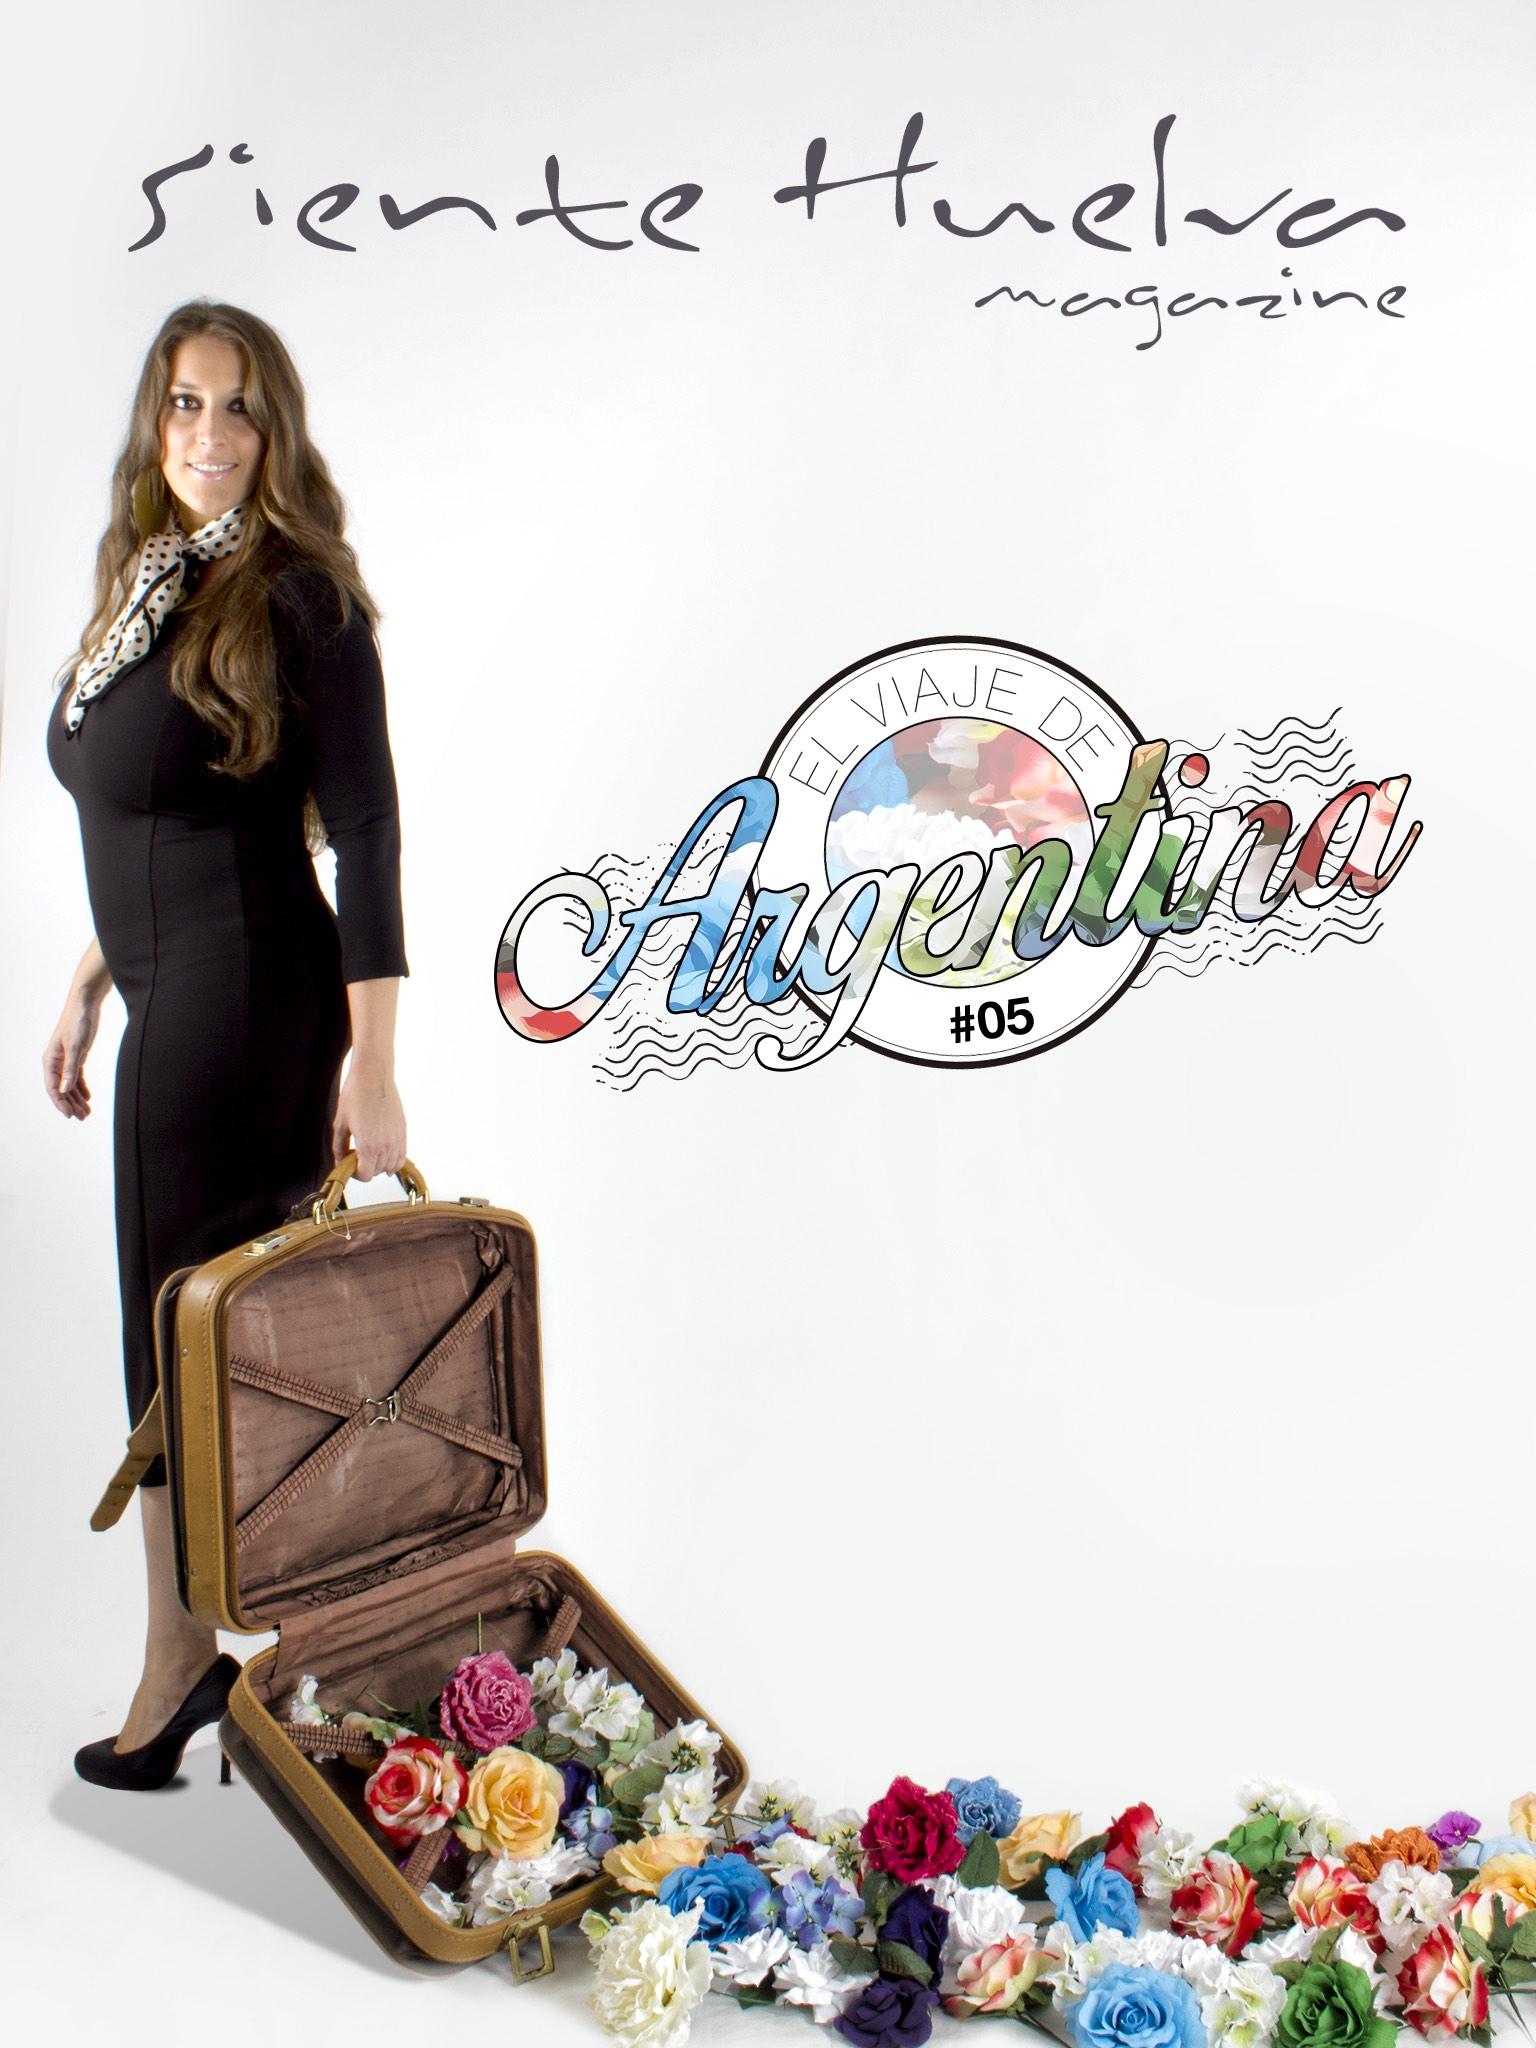 portada-argentina-sientehuelva